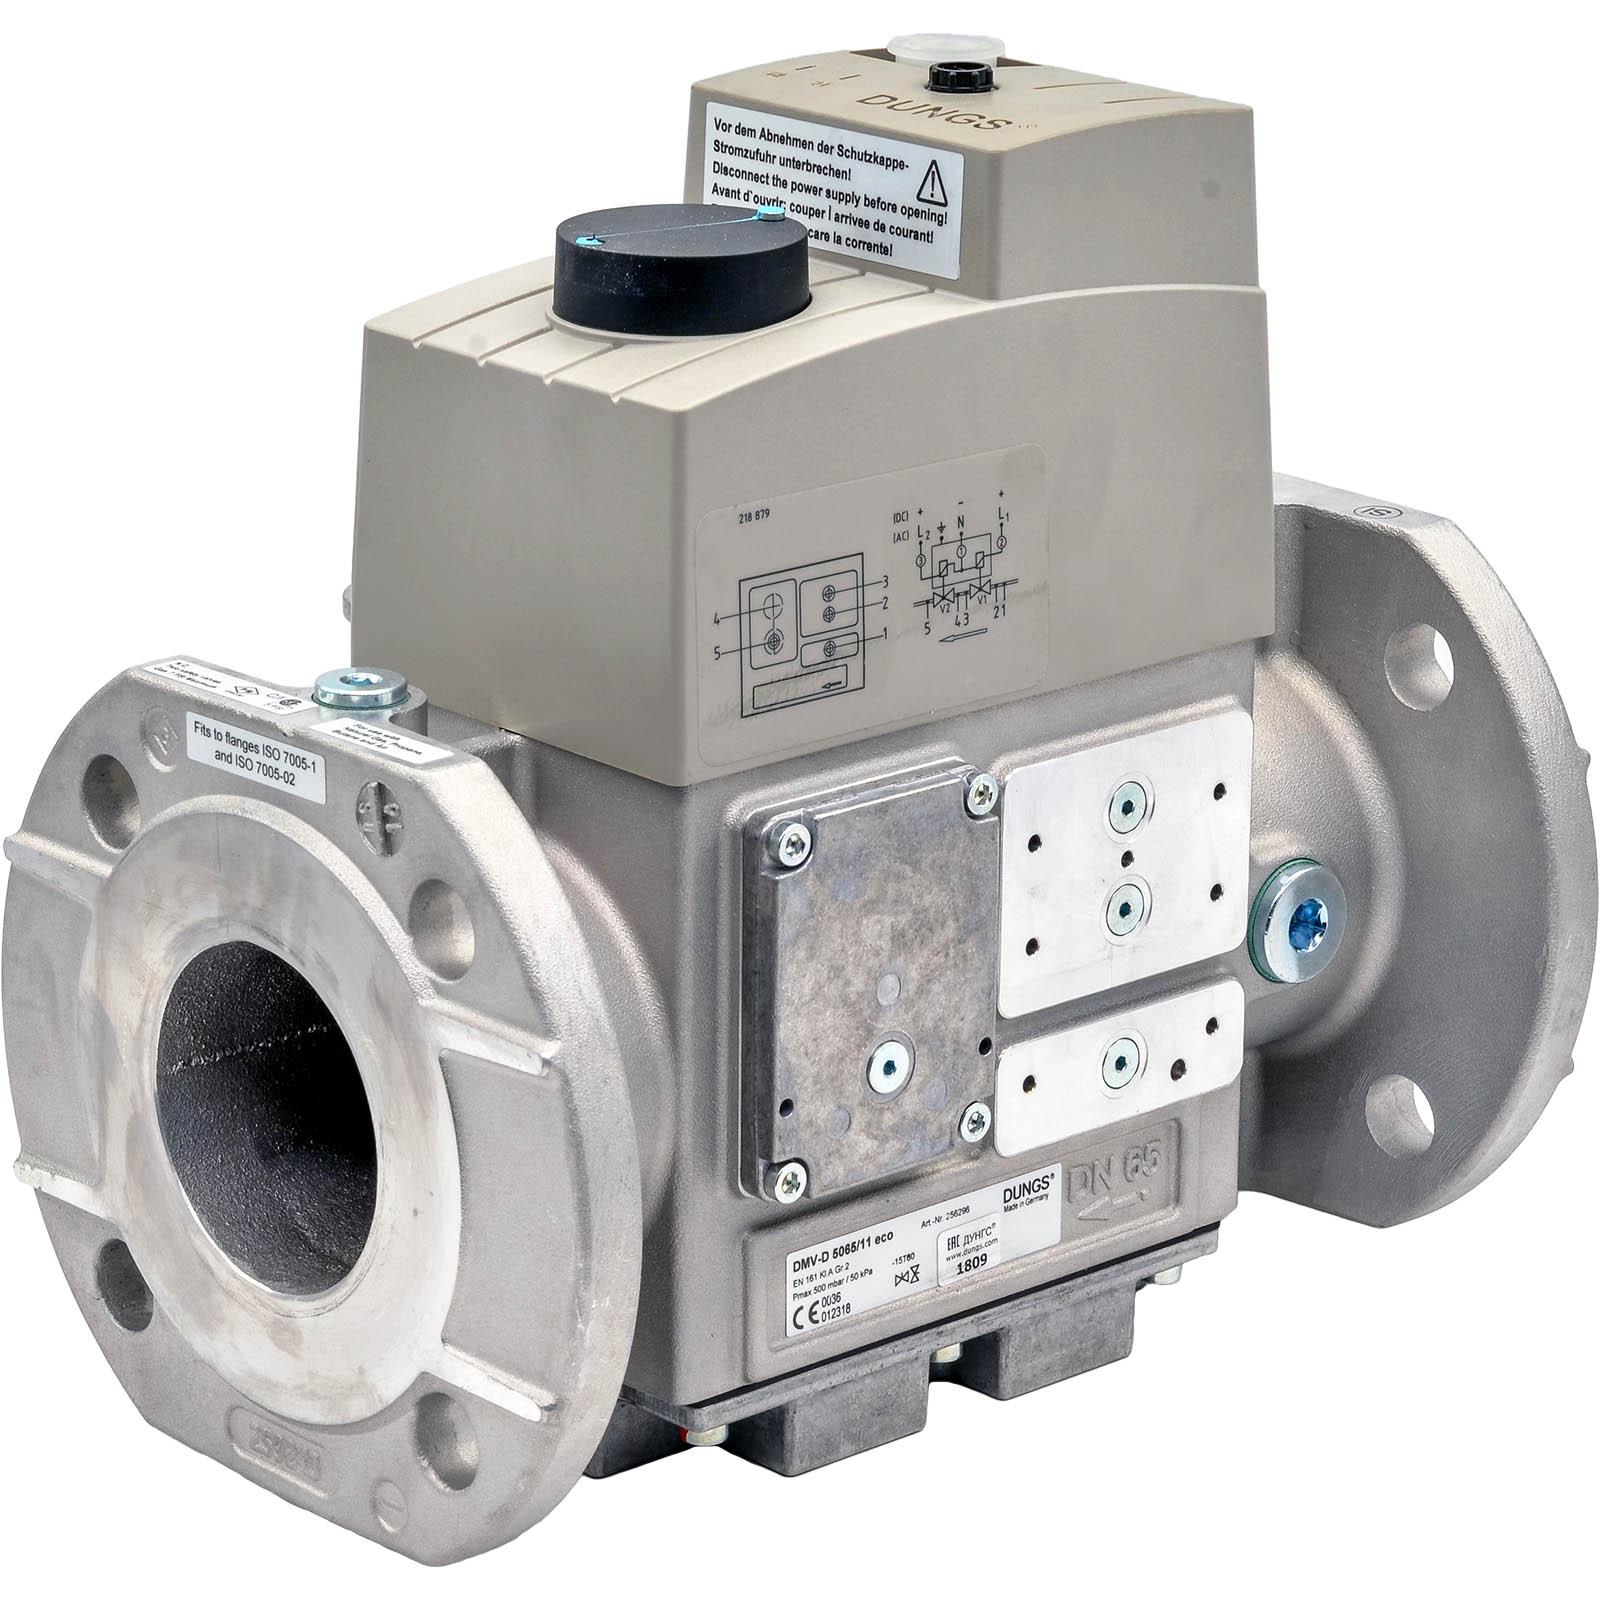 DMV-DLE 5065/11 eco арт.256297 Двойной электромагнитный клапан  фирмы DUNGS